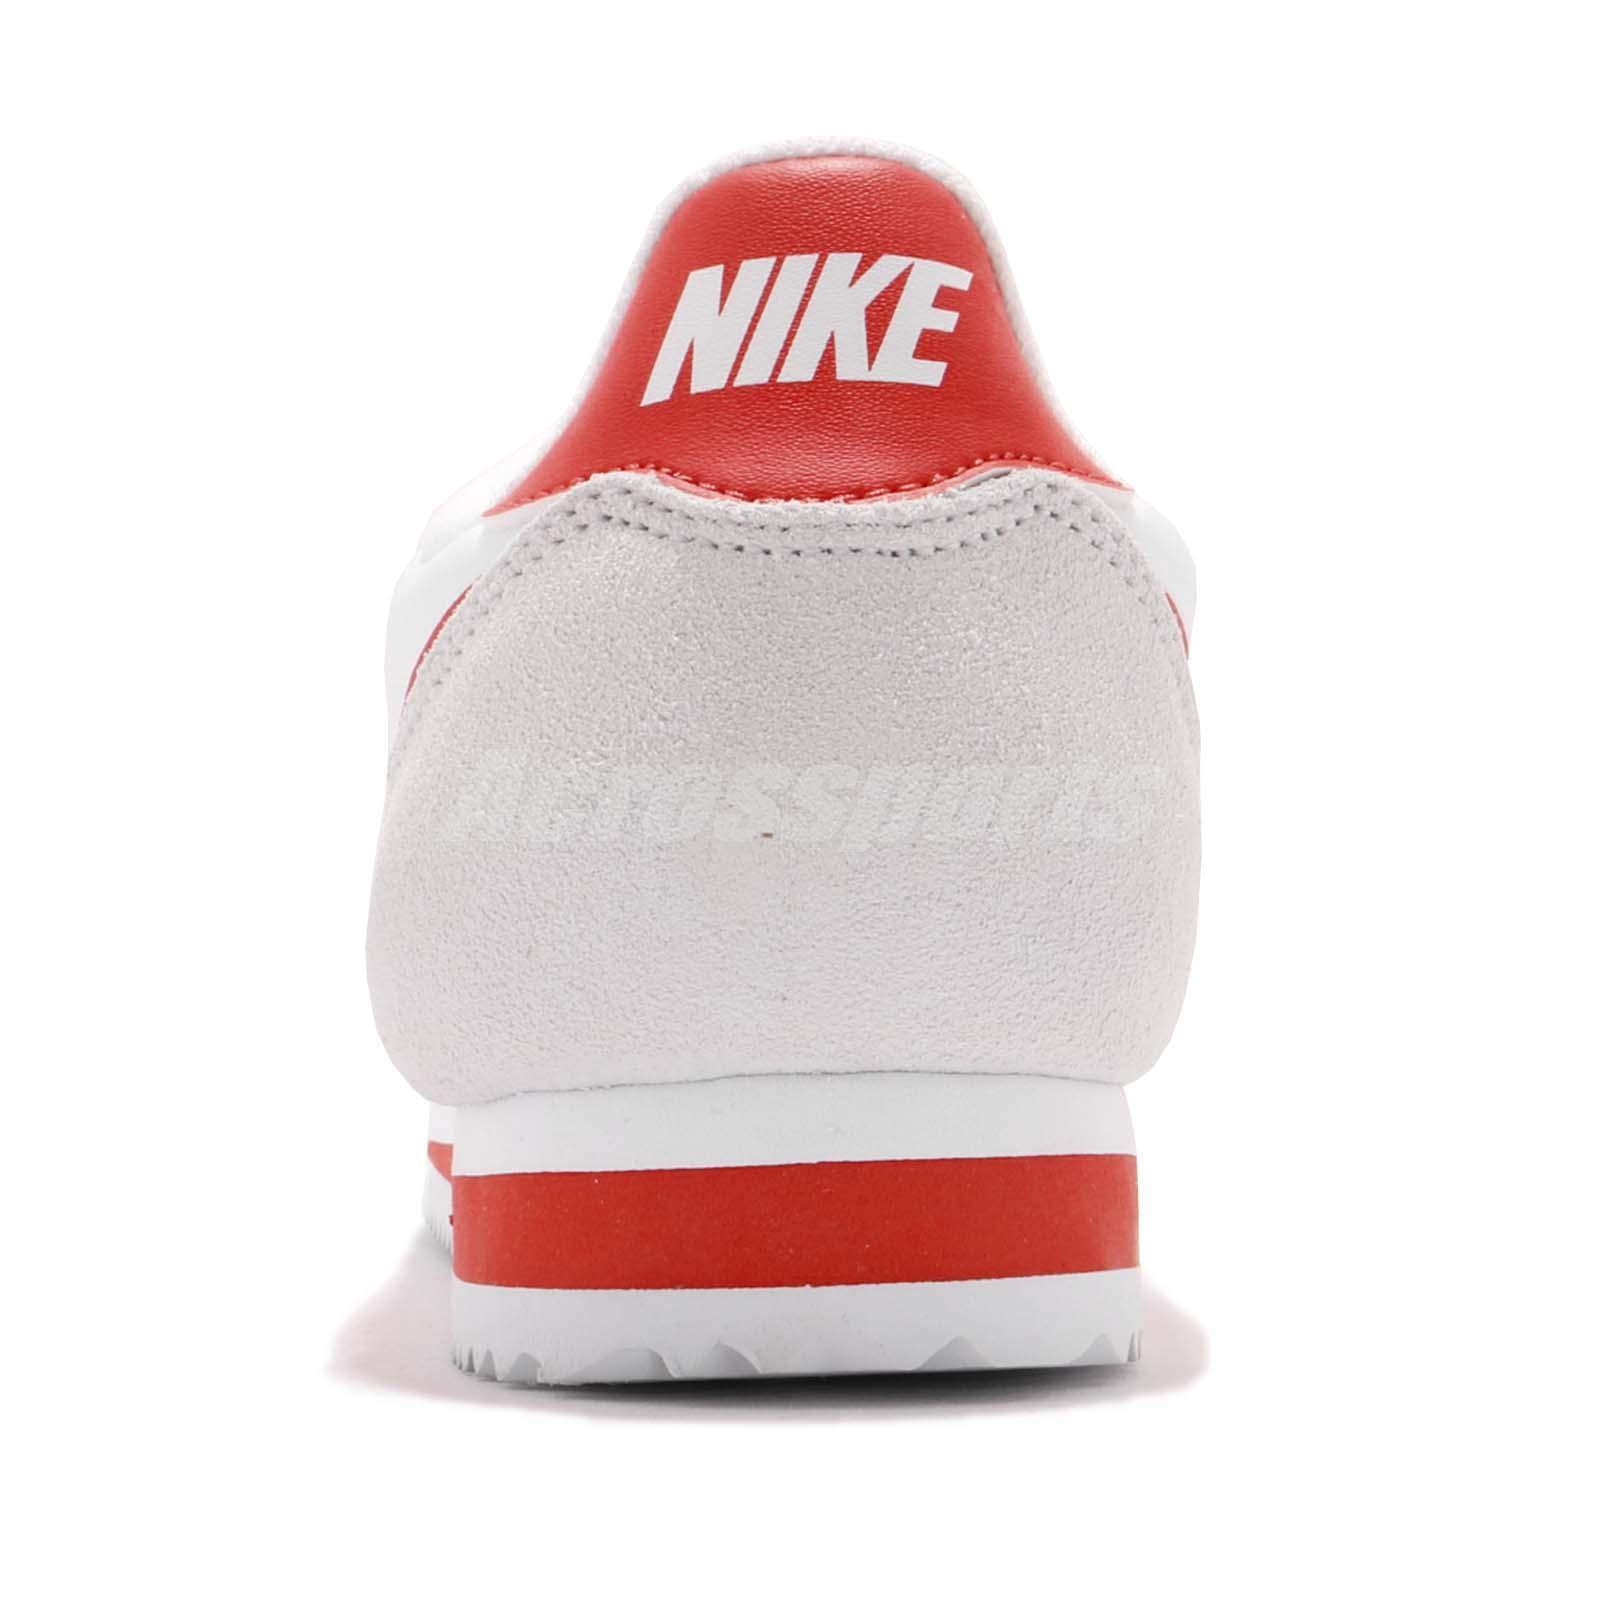 eb9f394d76 Nike Classic Cortez Nylon White Habanero Red Men Running Shoe ...